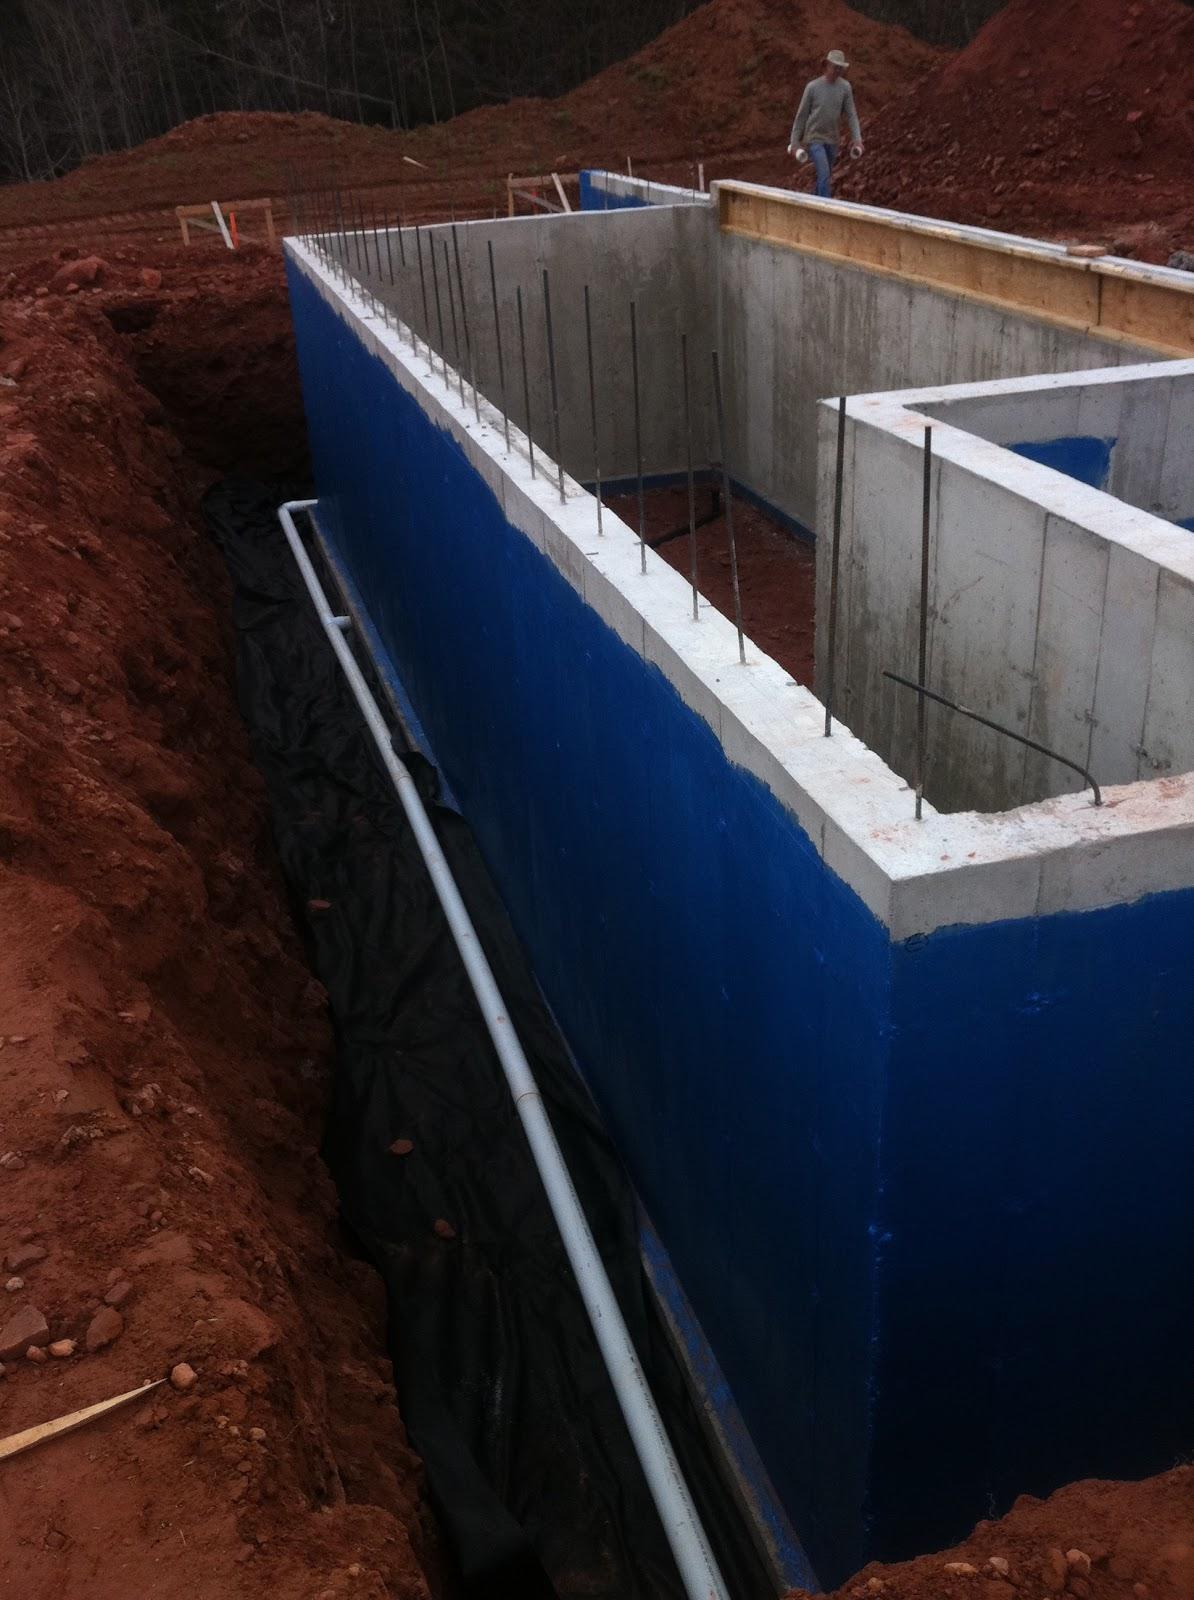 http://2.bp.blogspot.com/-d3wlVrXLv5A/TdEhdLv8b_I/AAAAAAAAABw/RZQsbBZ08jg/s1600/Blue+Seal+on+Basement+walls.JPG